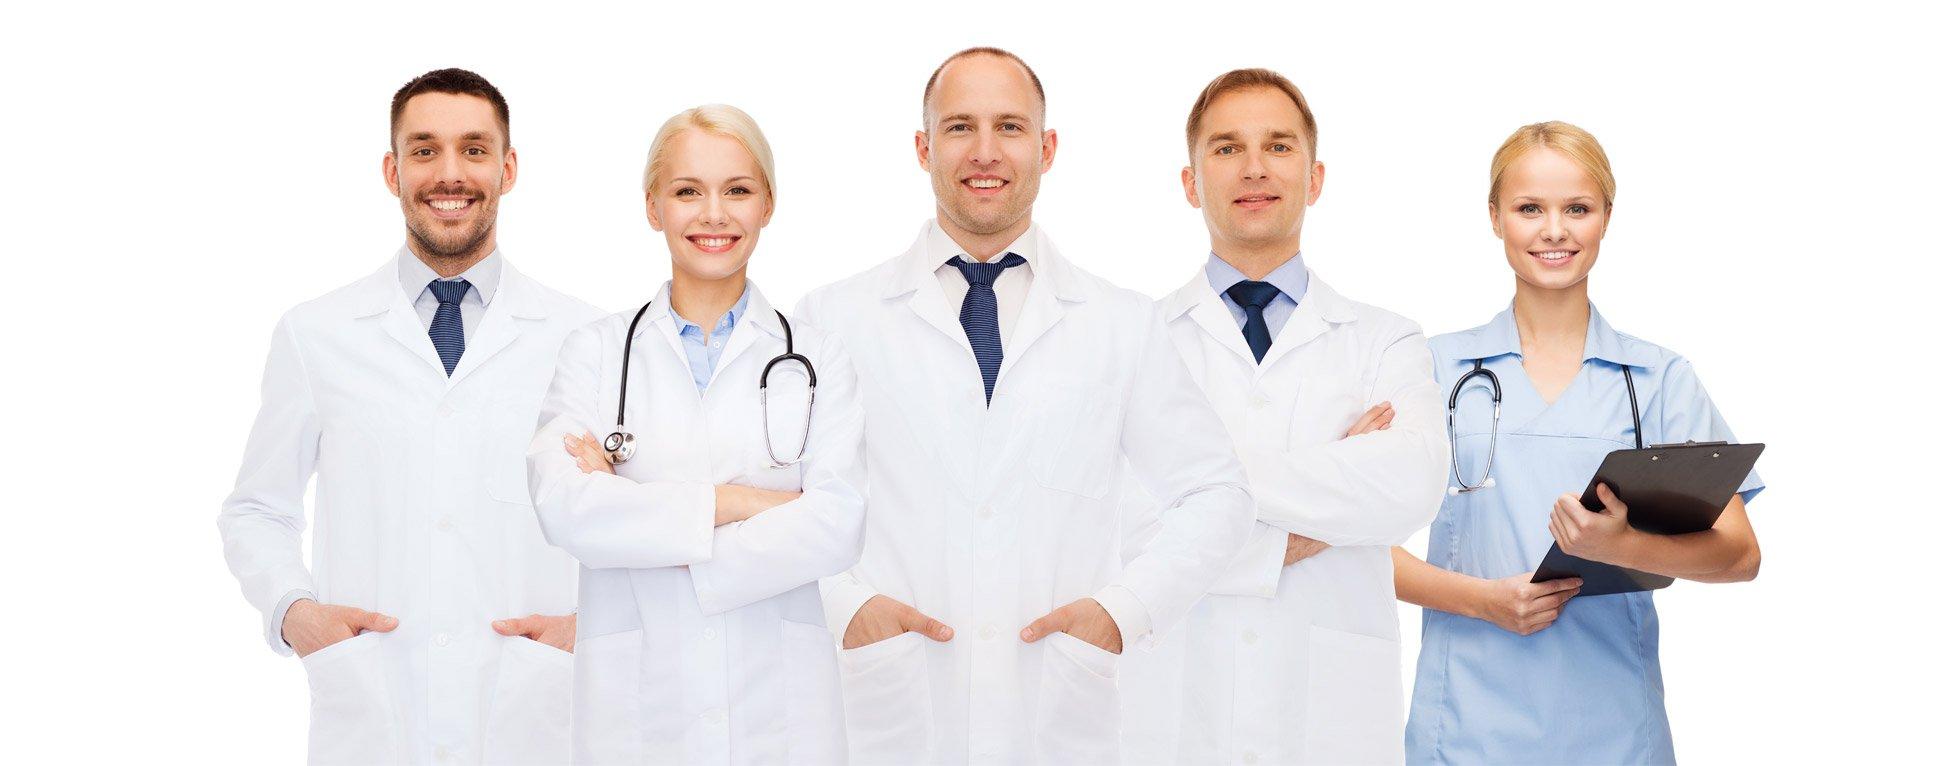 Urgent Care in Provo Dr Team